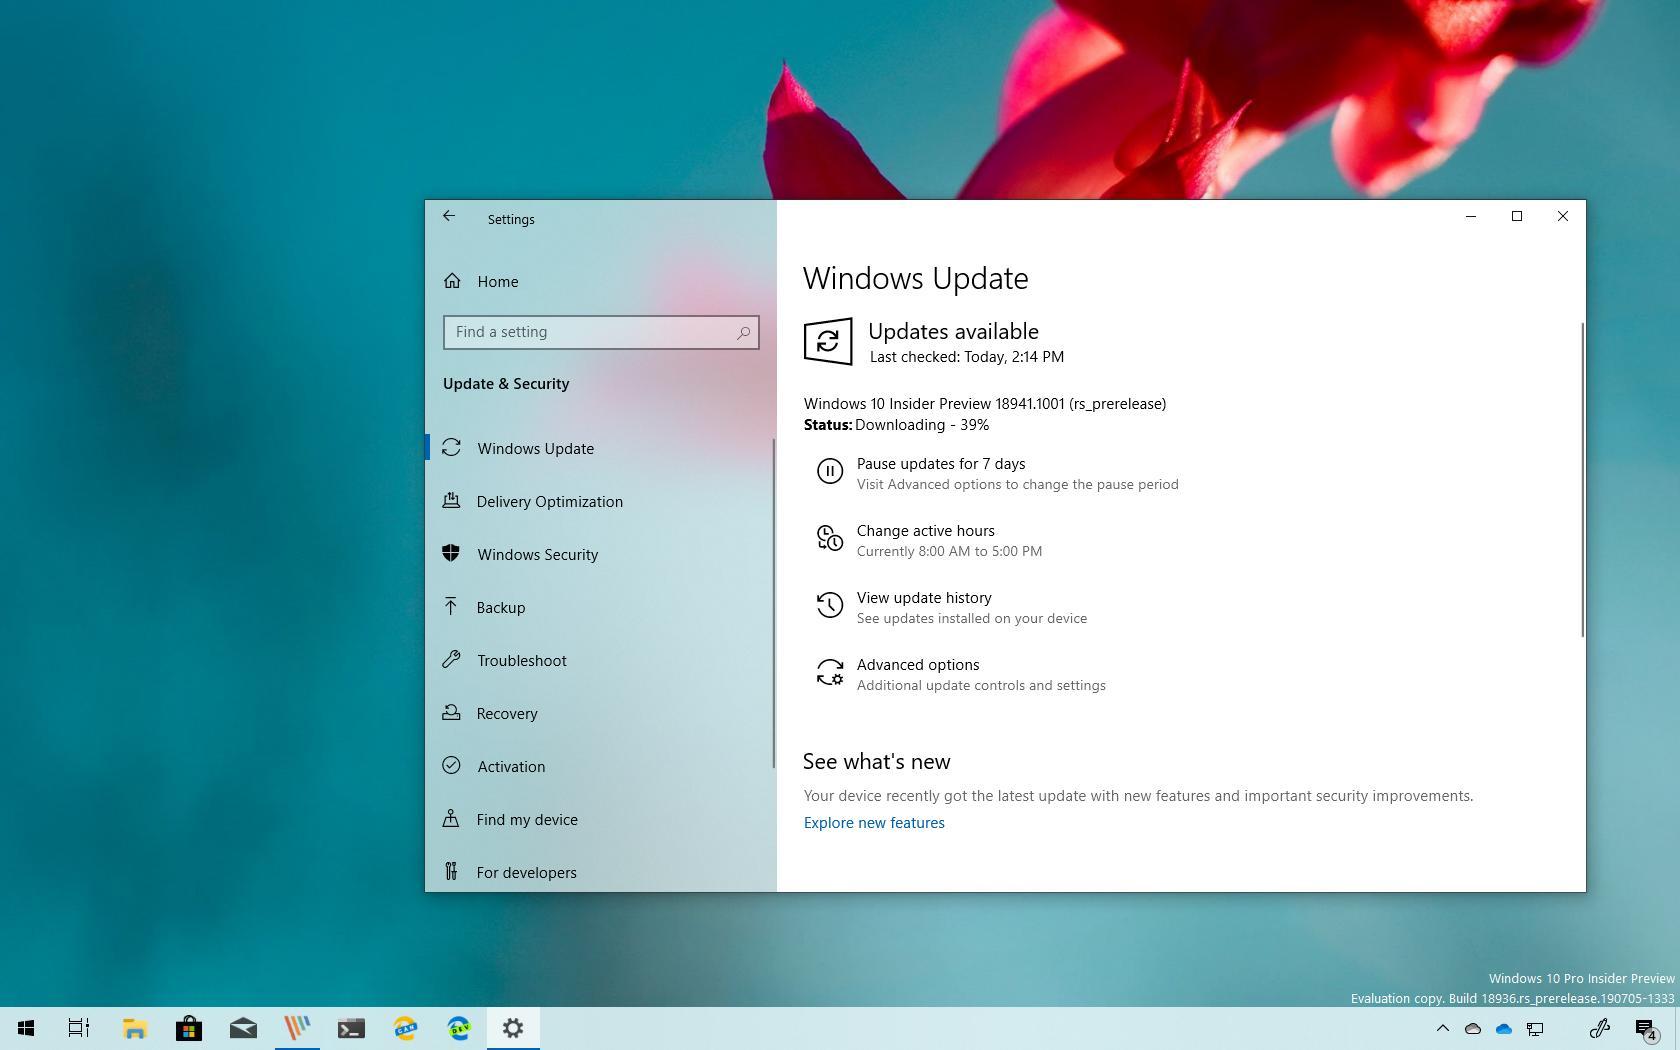 Windows 10 build 18941 download